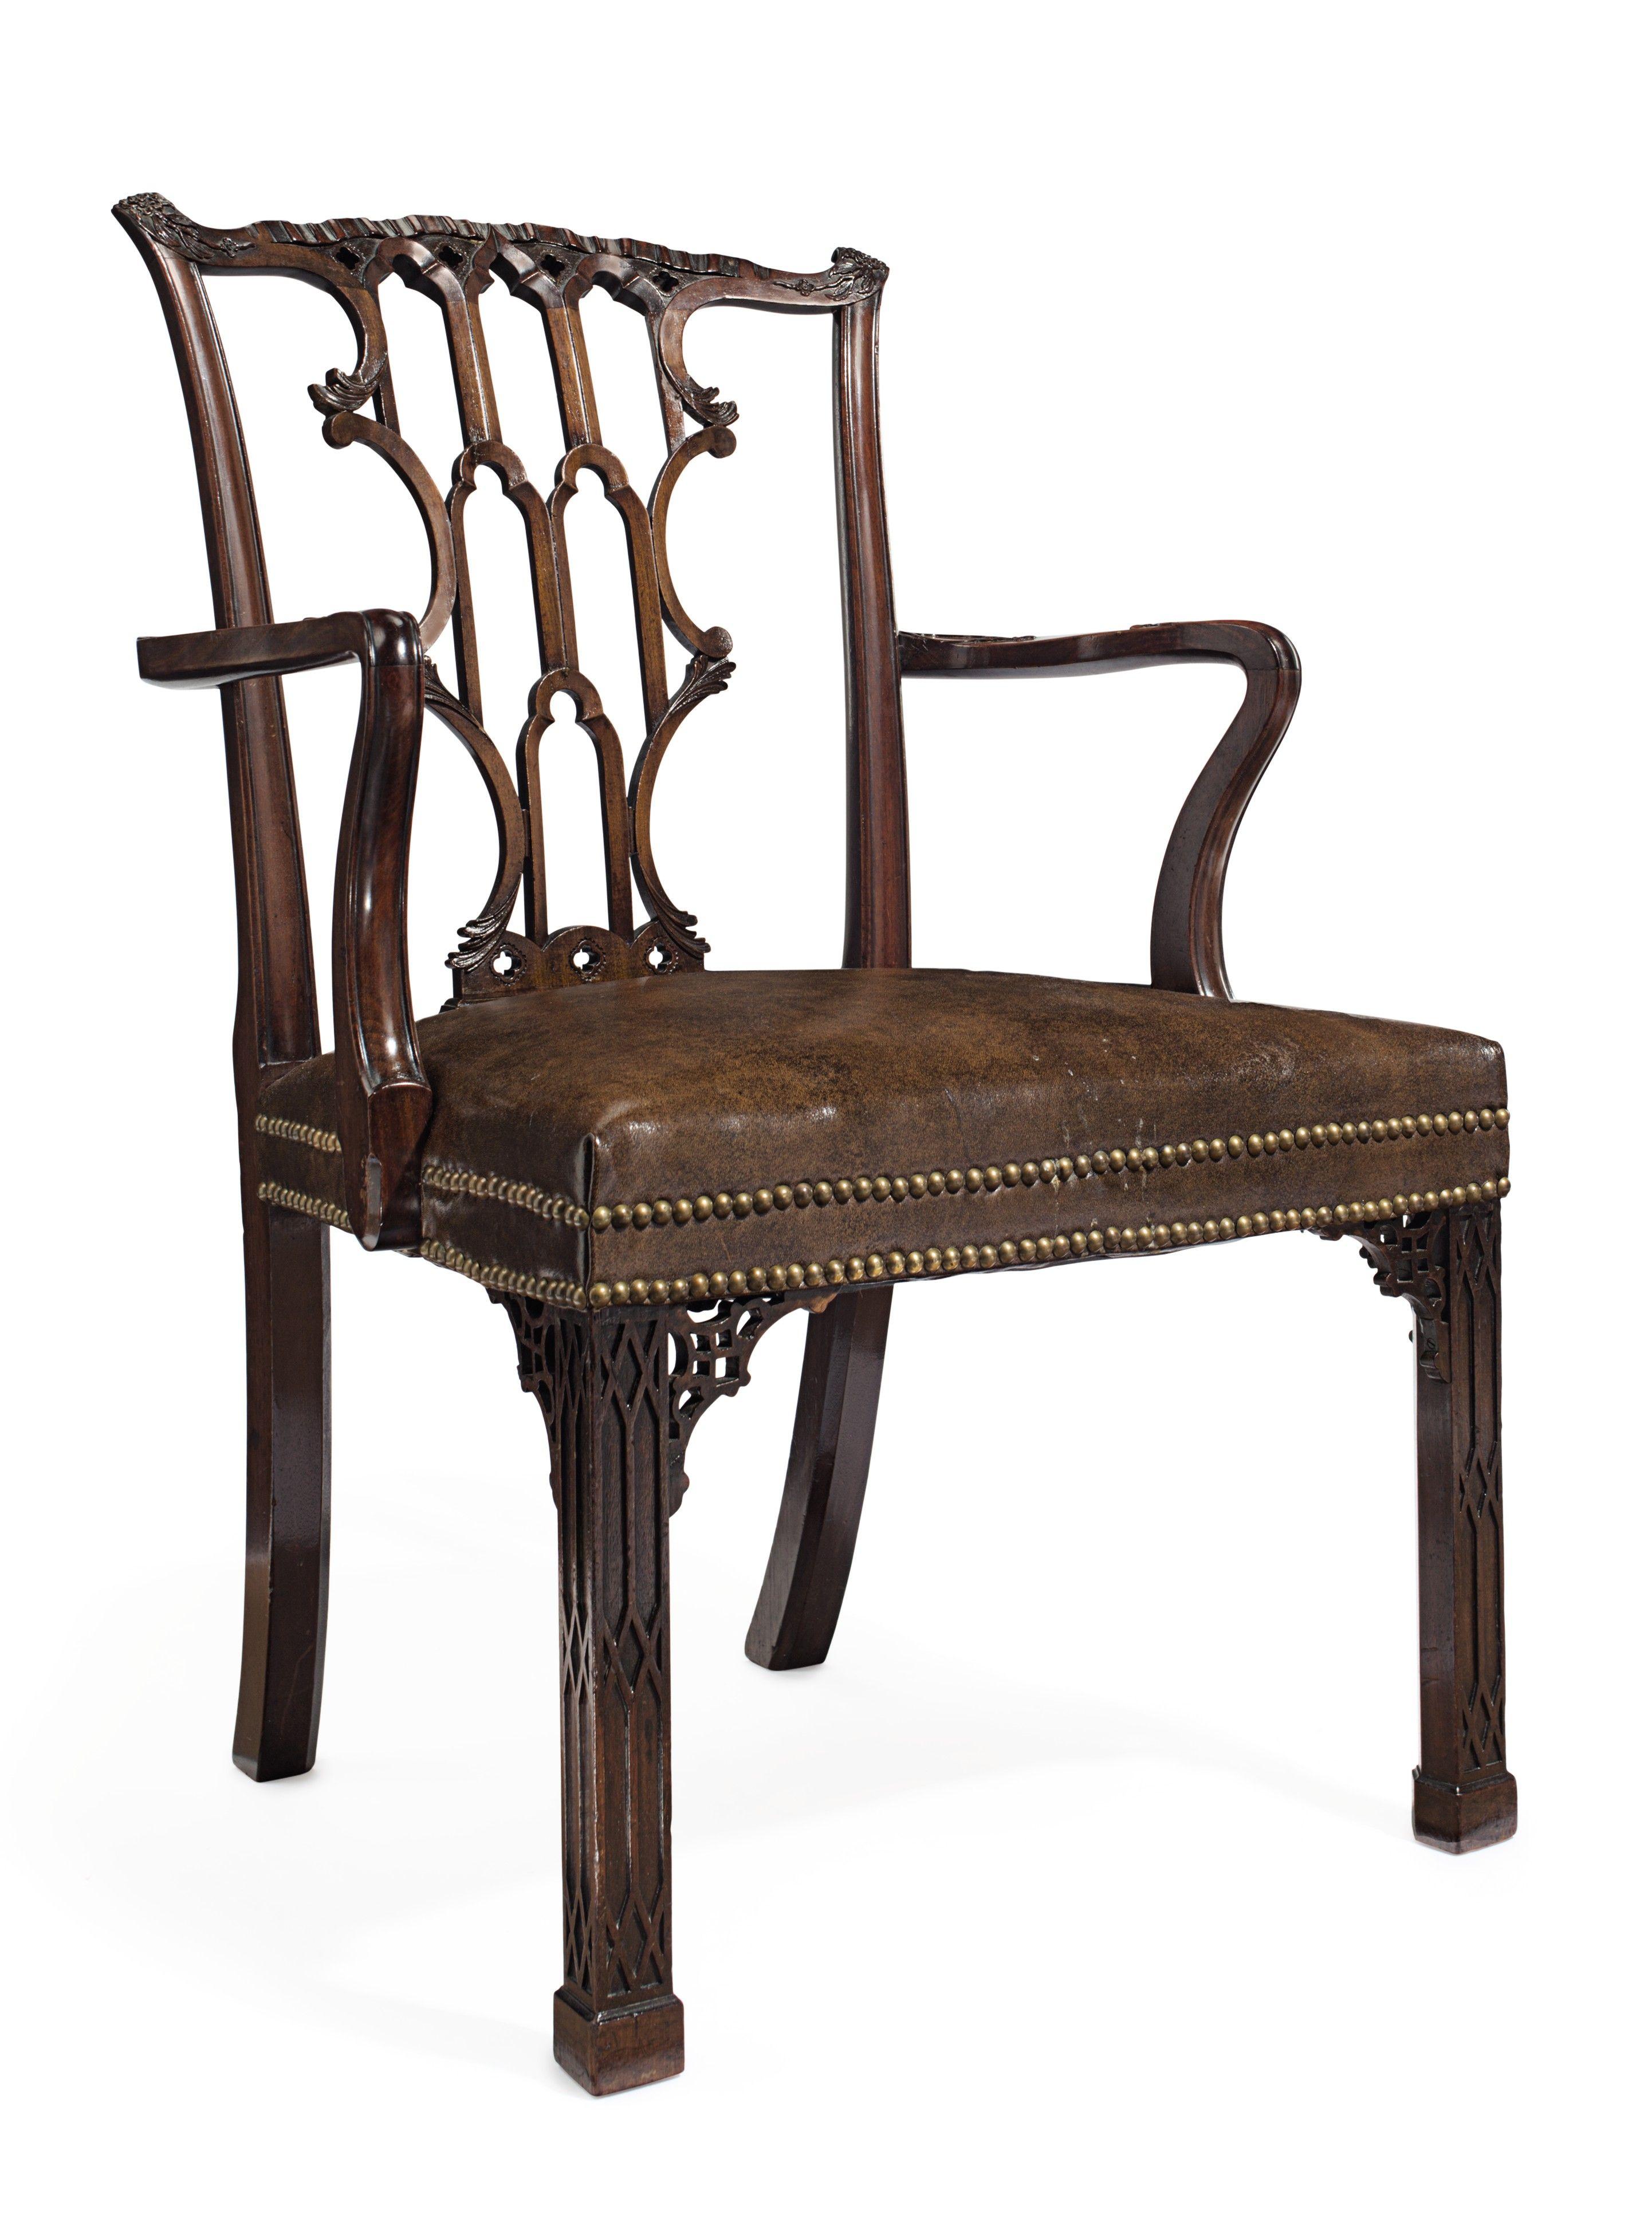 Furniture Classics Living Room Oda High Back Chair 90 29 Georgian Furnishing And Bergerhome New Orleans And Mandeville La Ghế Sofa Ghế